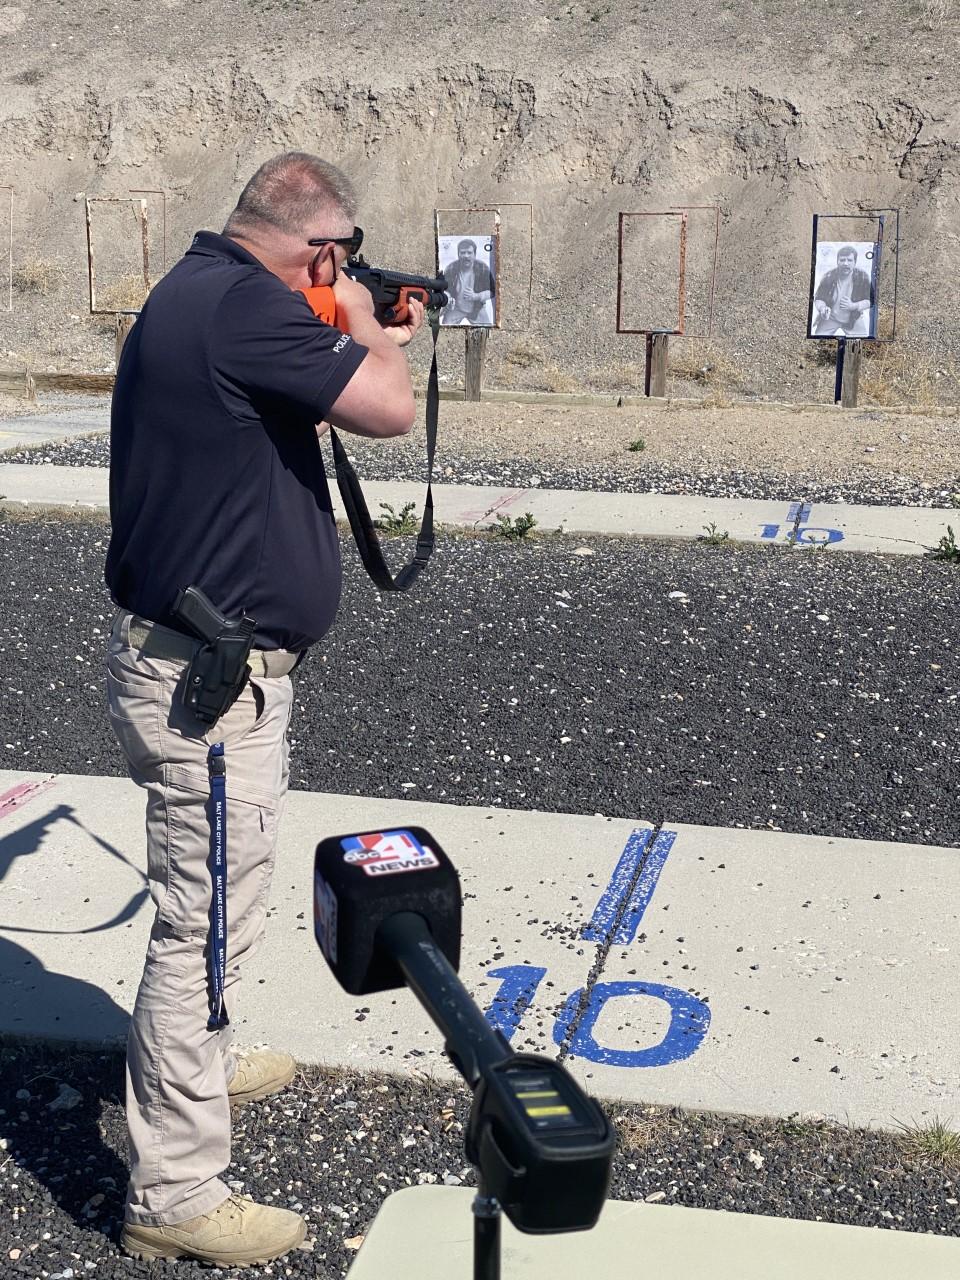 Salt Lake City police non-lethal